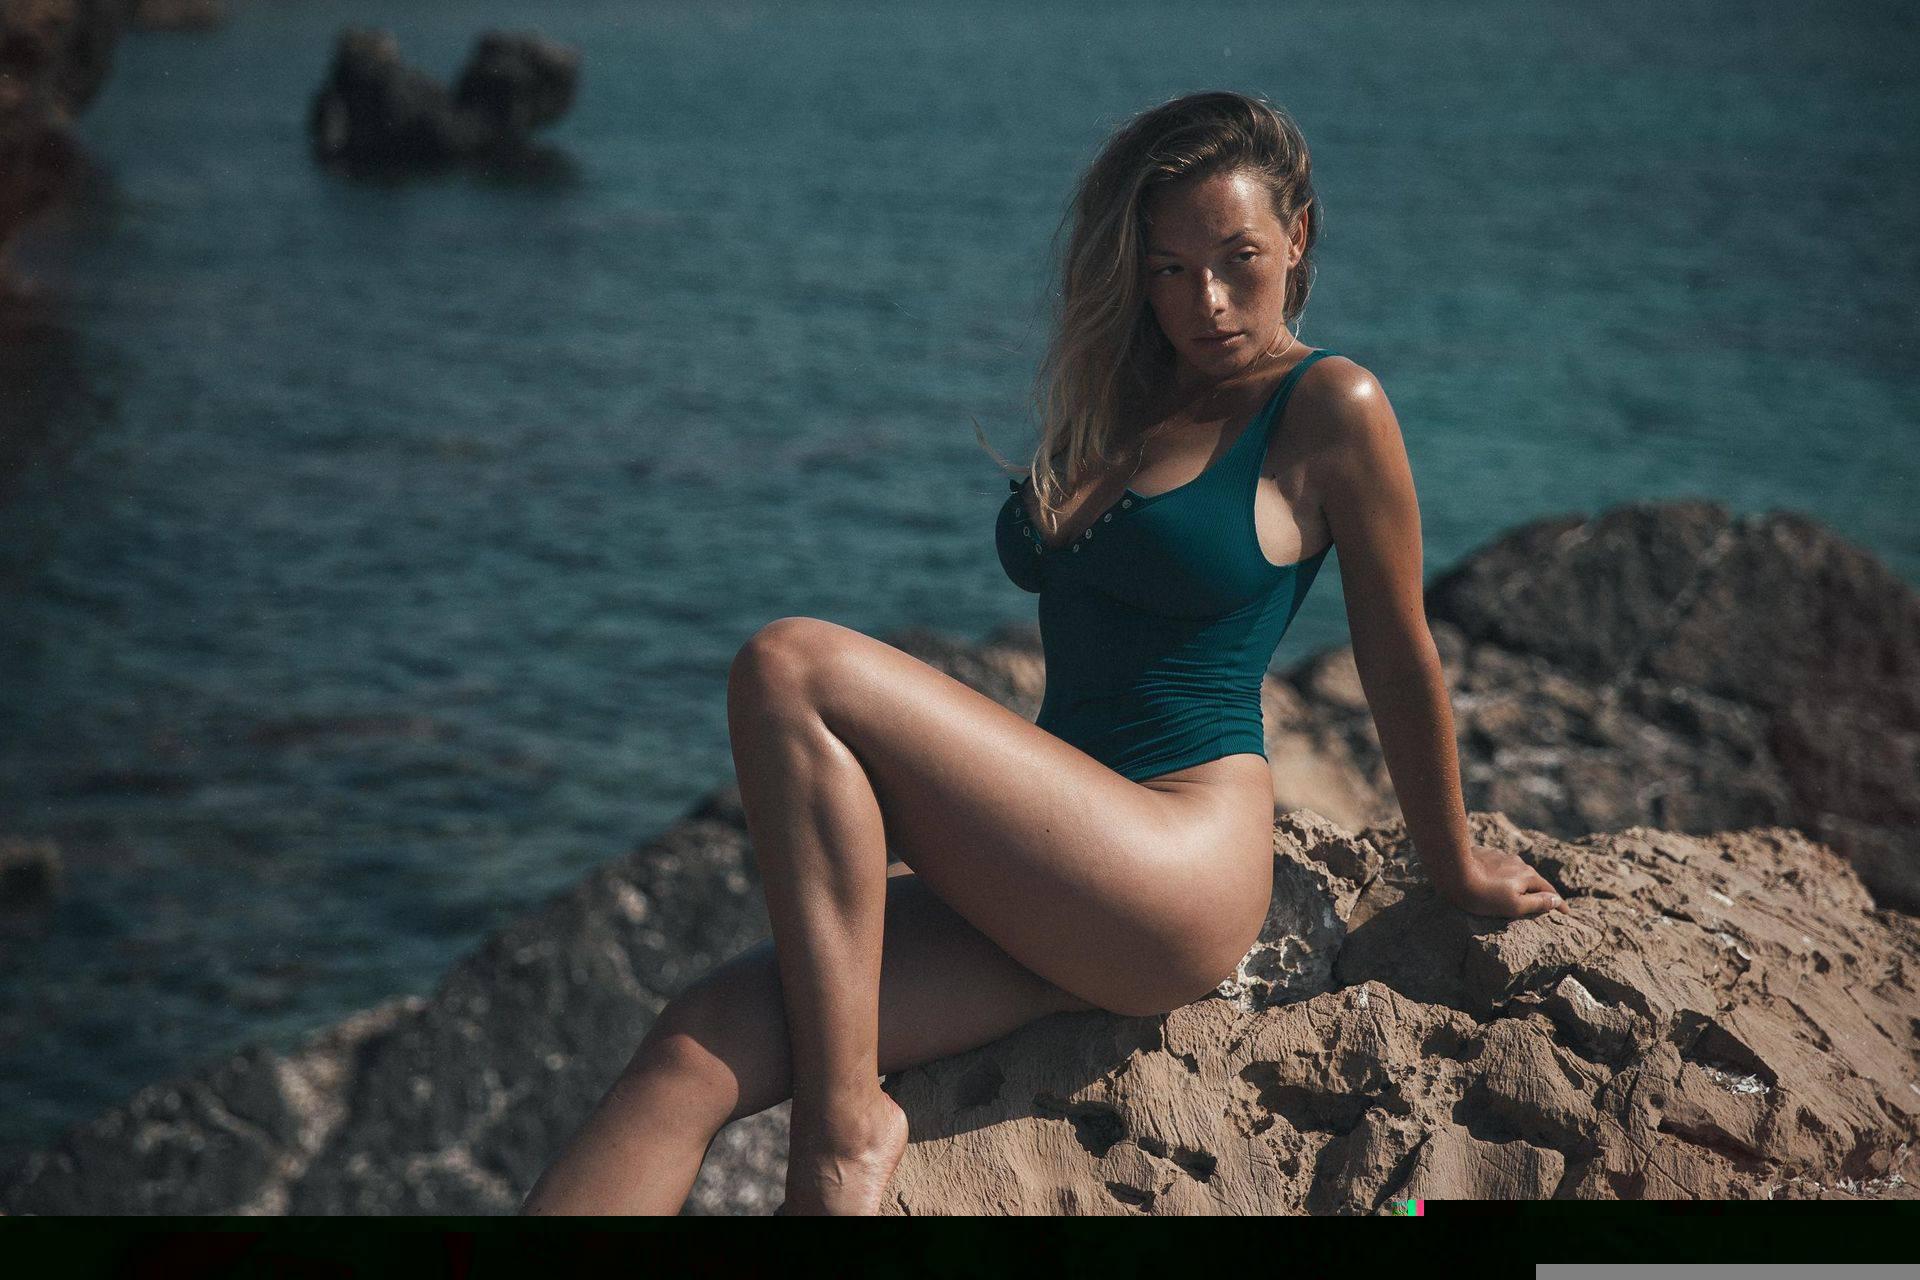 Olga Kobzar – Hot Big Boobs In Sexy Full Frontal Nude Photoshoot By Thomas Agatz (nsfw) 0023